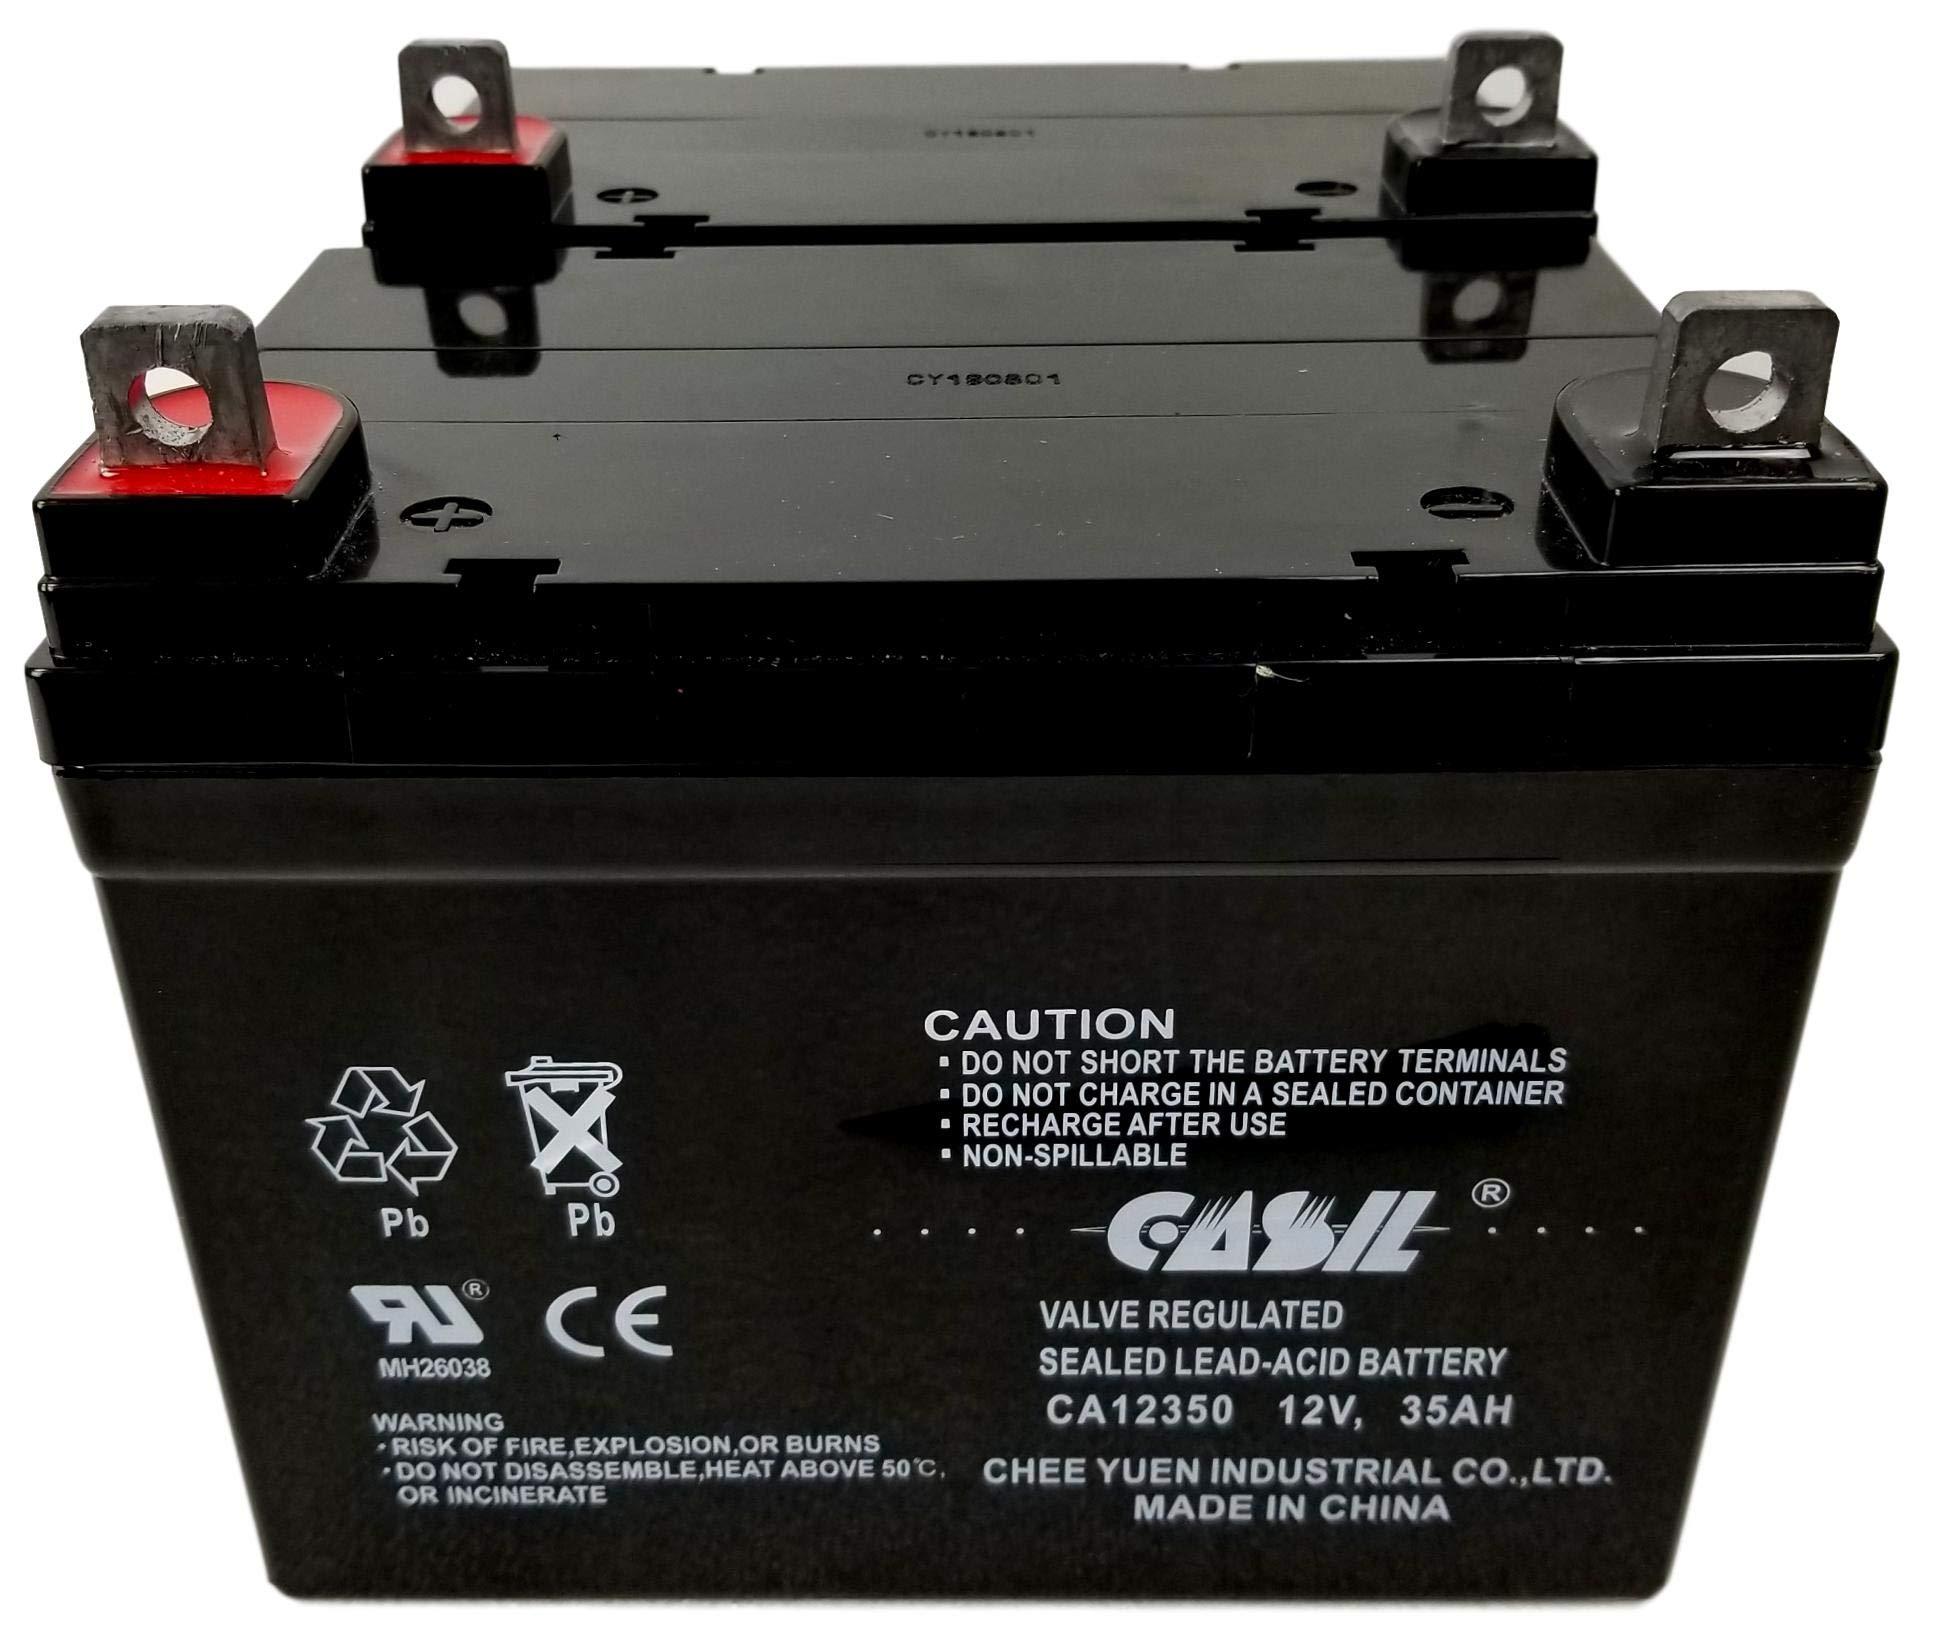 2 Pack Casil 12v 35ah for Rascal 445PC, 600C, 600F, 600T Battery by Casil